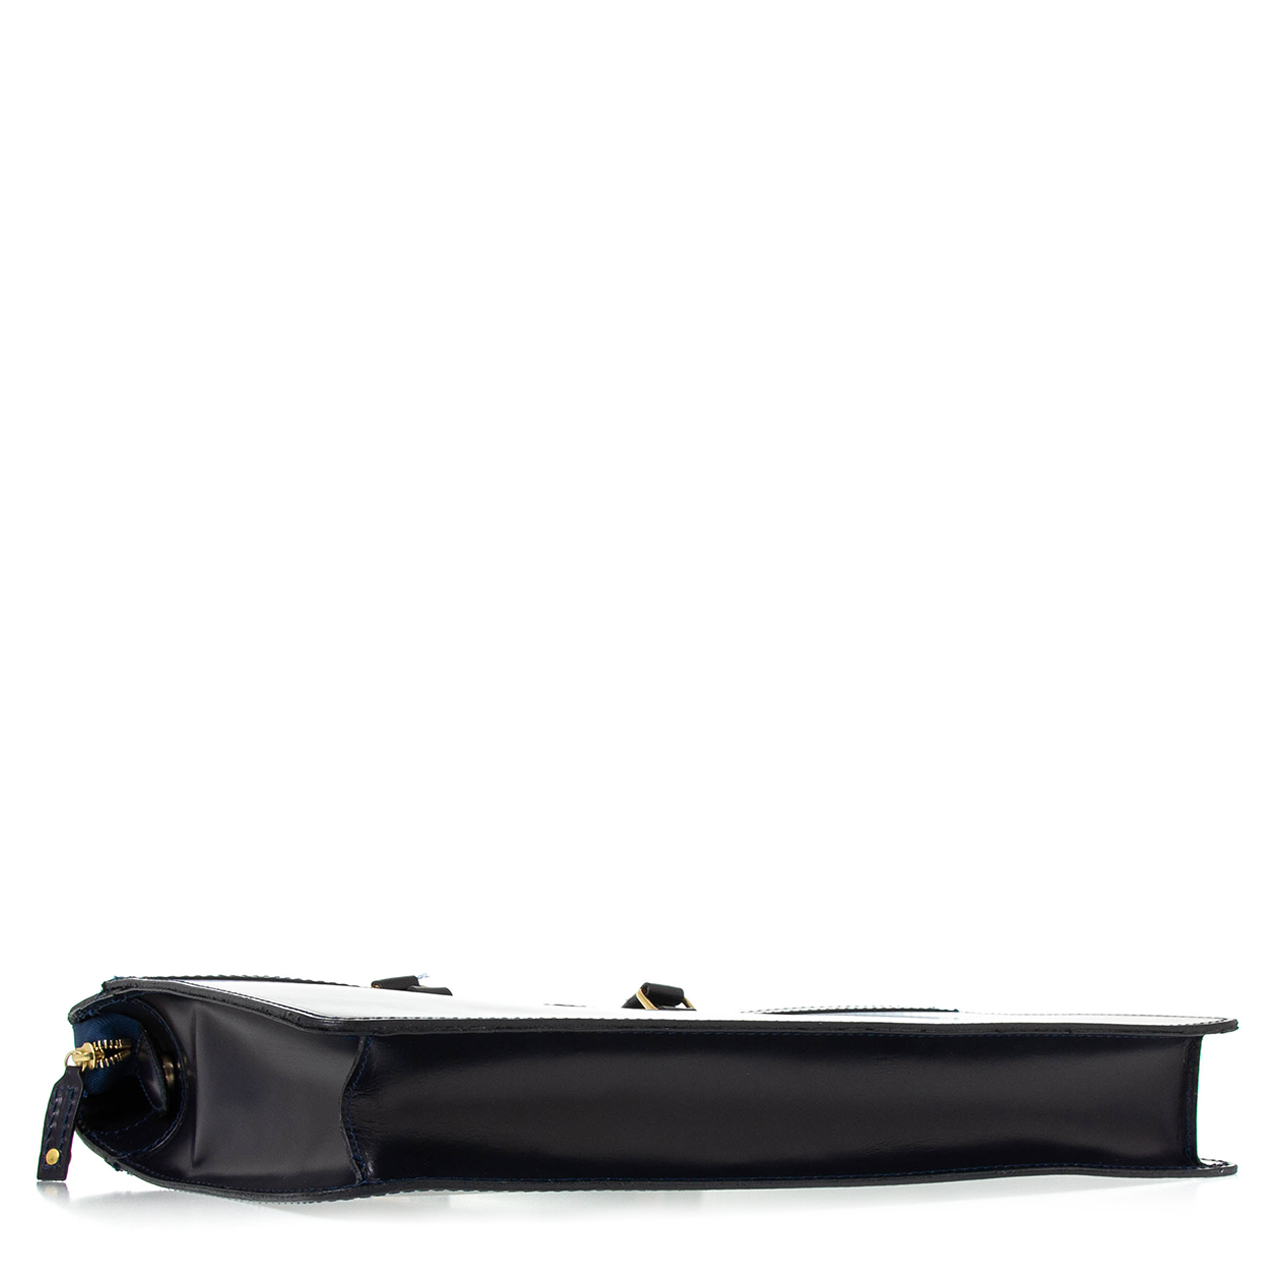 【5%OFFクーポン対象】 グレンロイヤル GLENROYAL バッグ メンズ ブリーフケース ネイビー 2 HANDLE ZIP CASE 02-5225 NAVY 【A4】【英国】